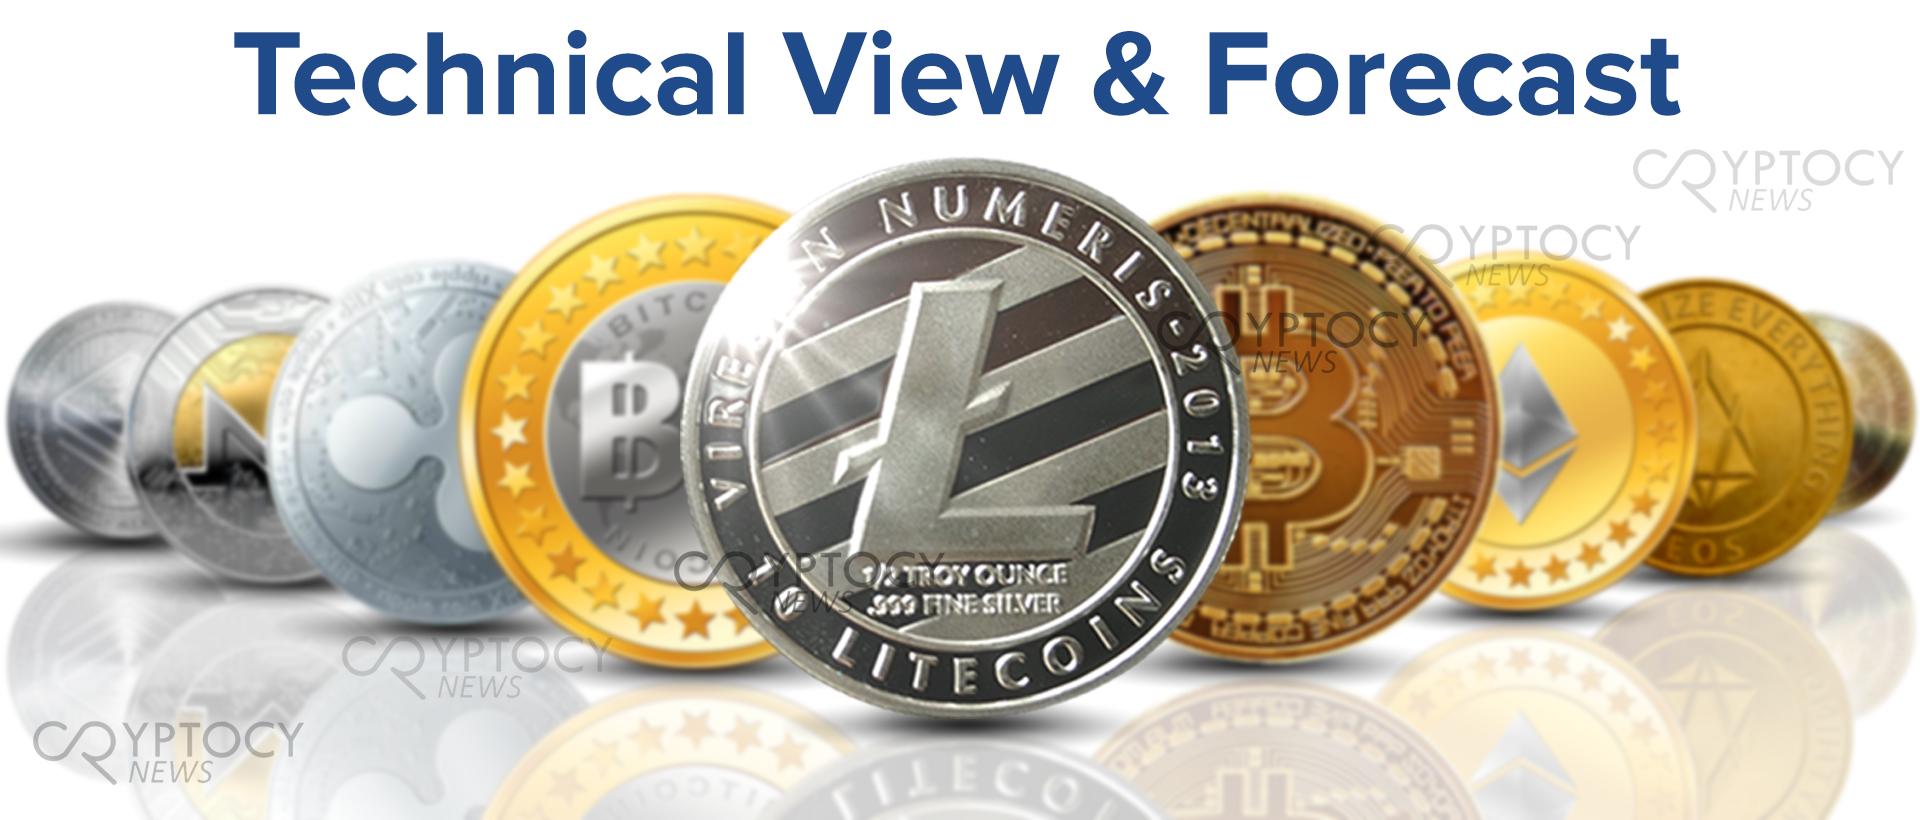 Litecoin Technical View 06/06/18